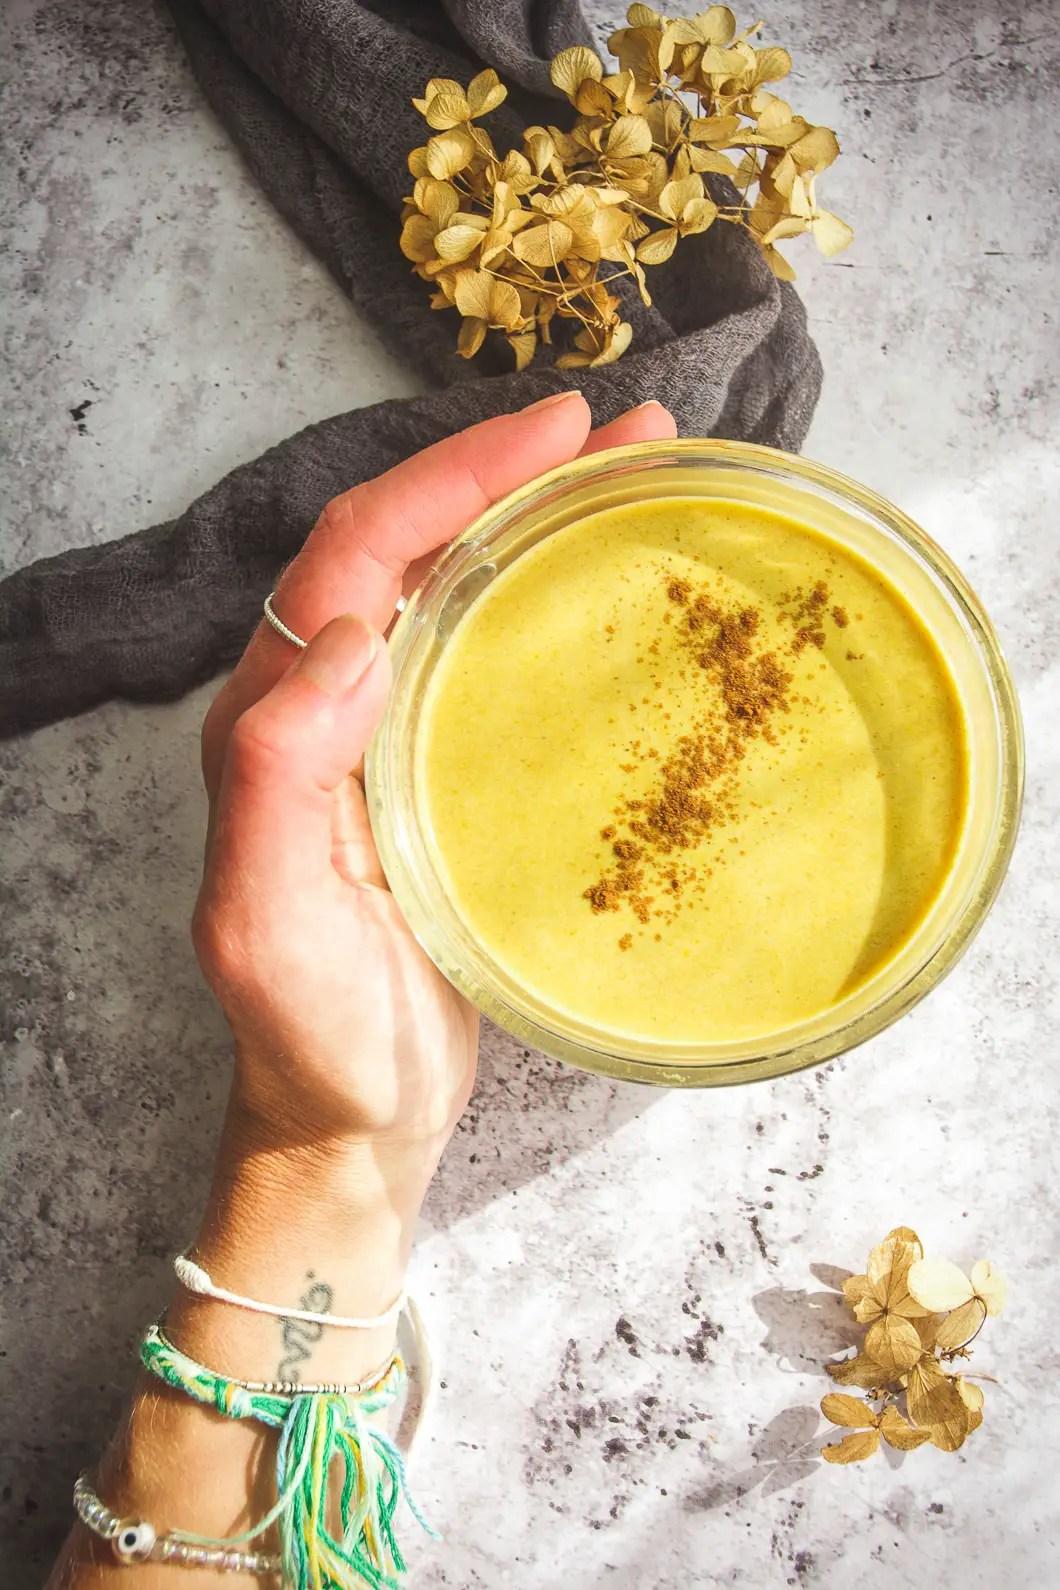 pumpkin spice latte in clear mug held by hand